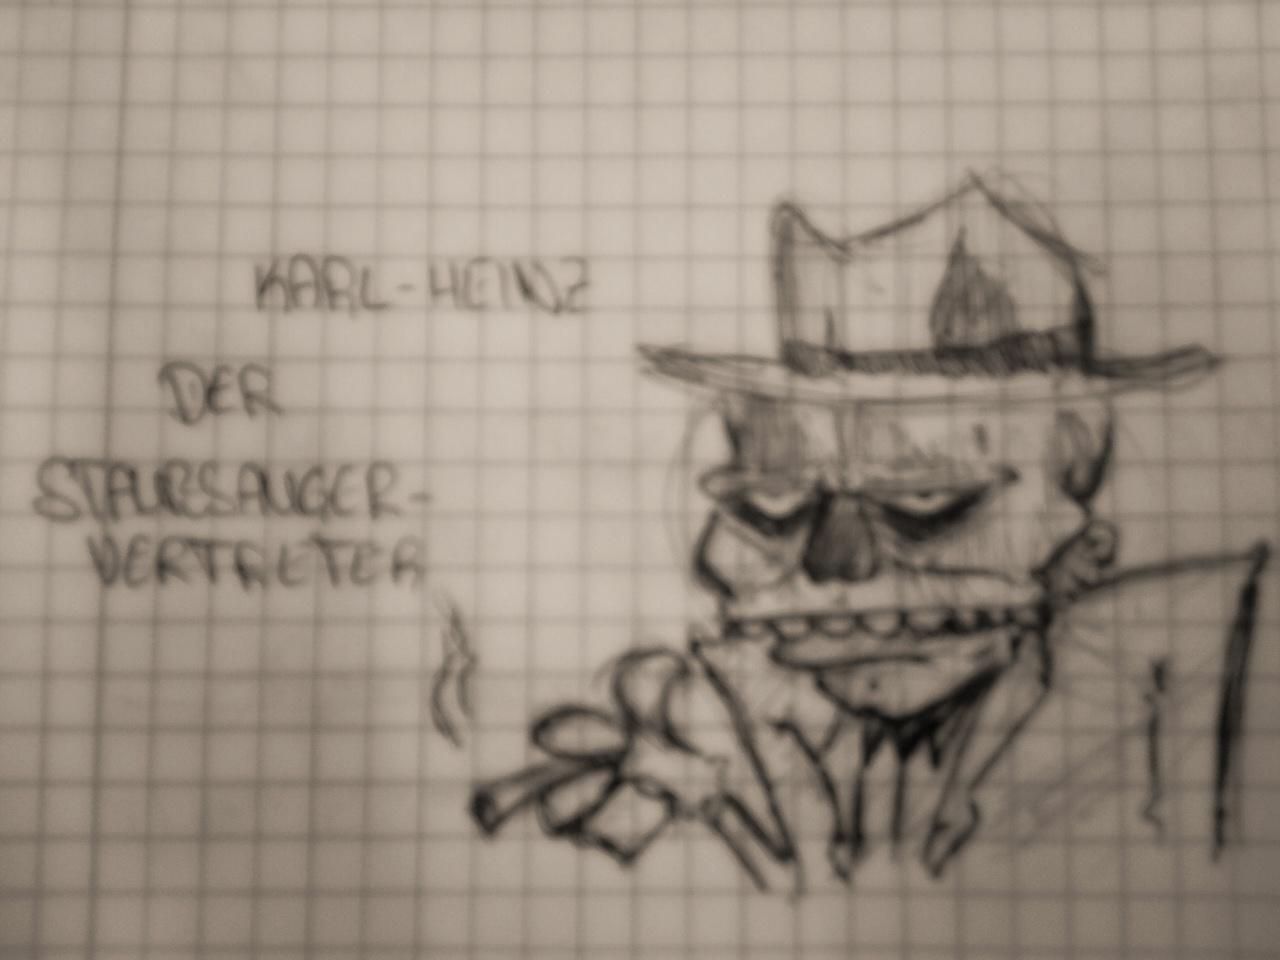 Karl-Heinz - Salesman